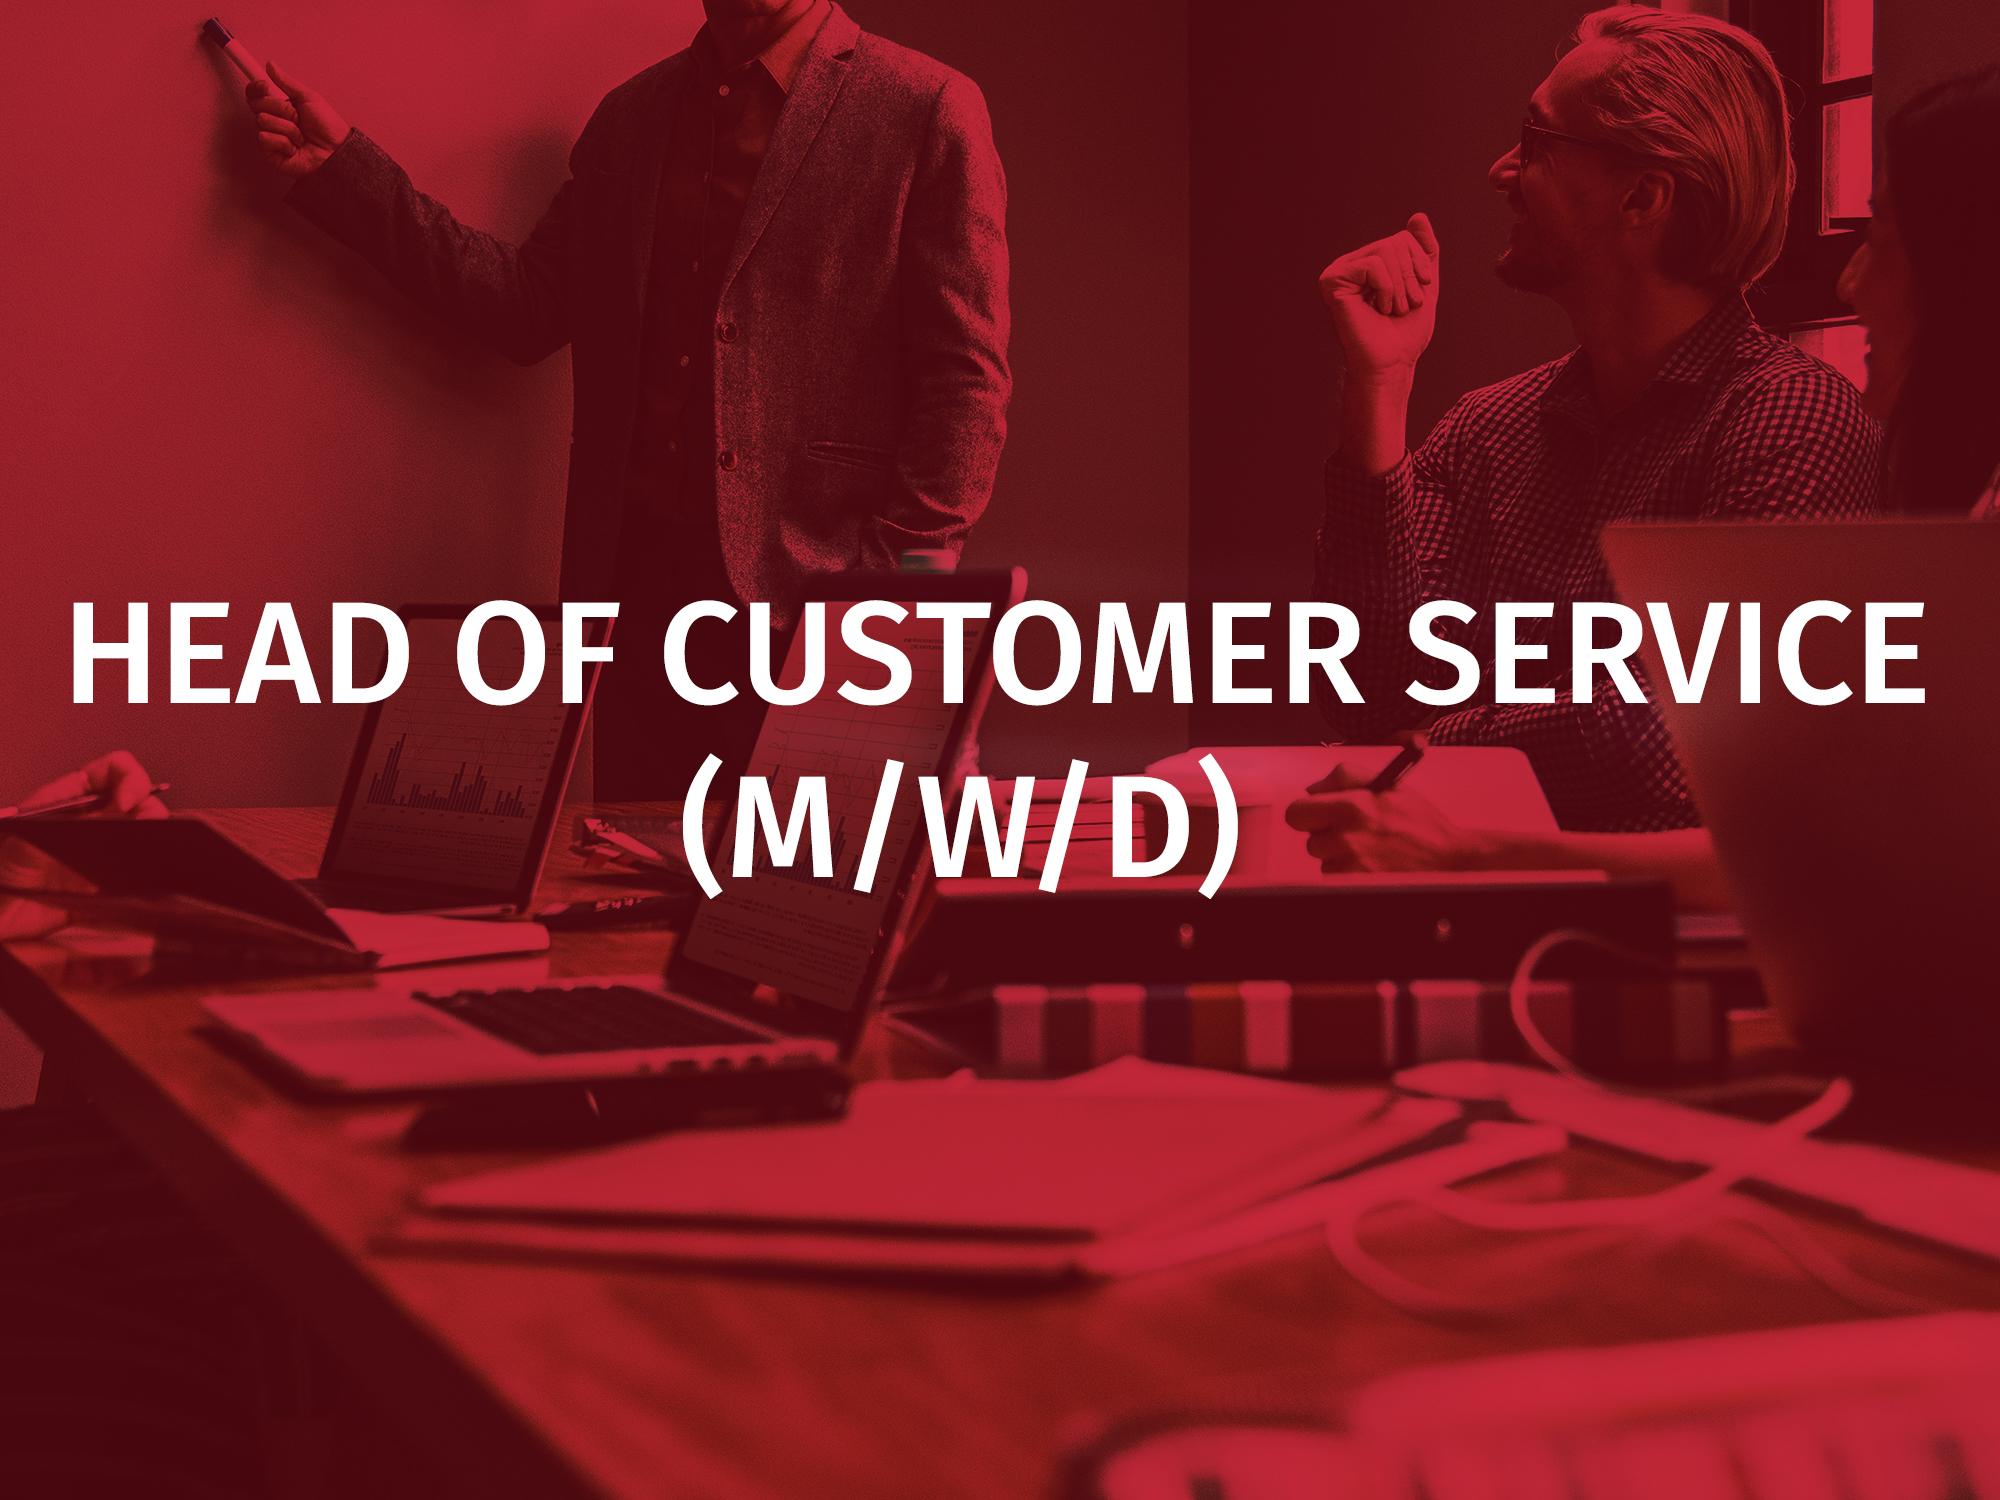 Head of Customer Service